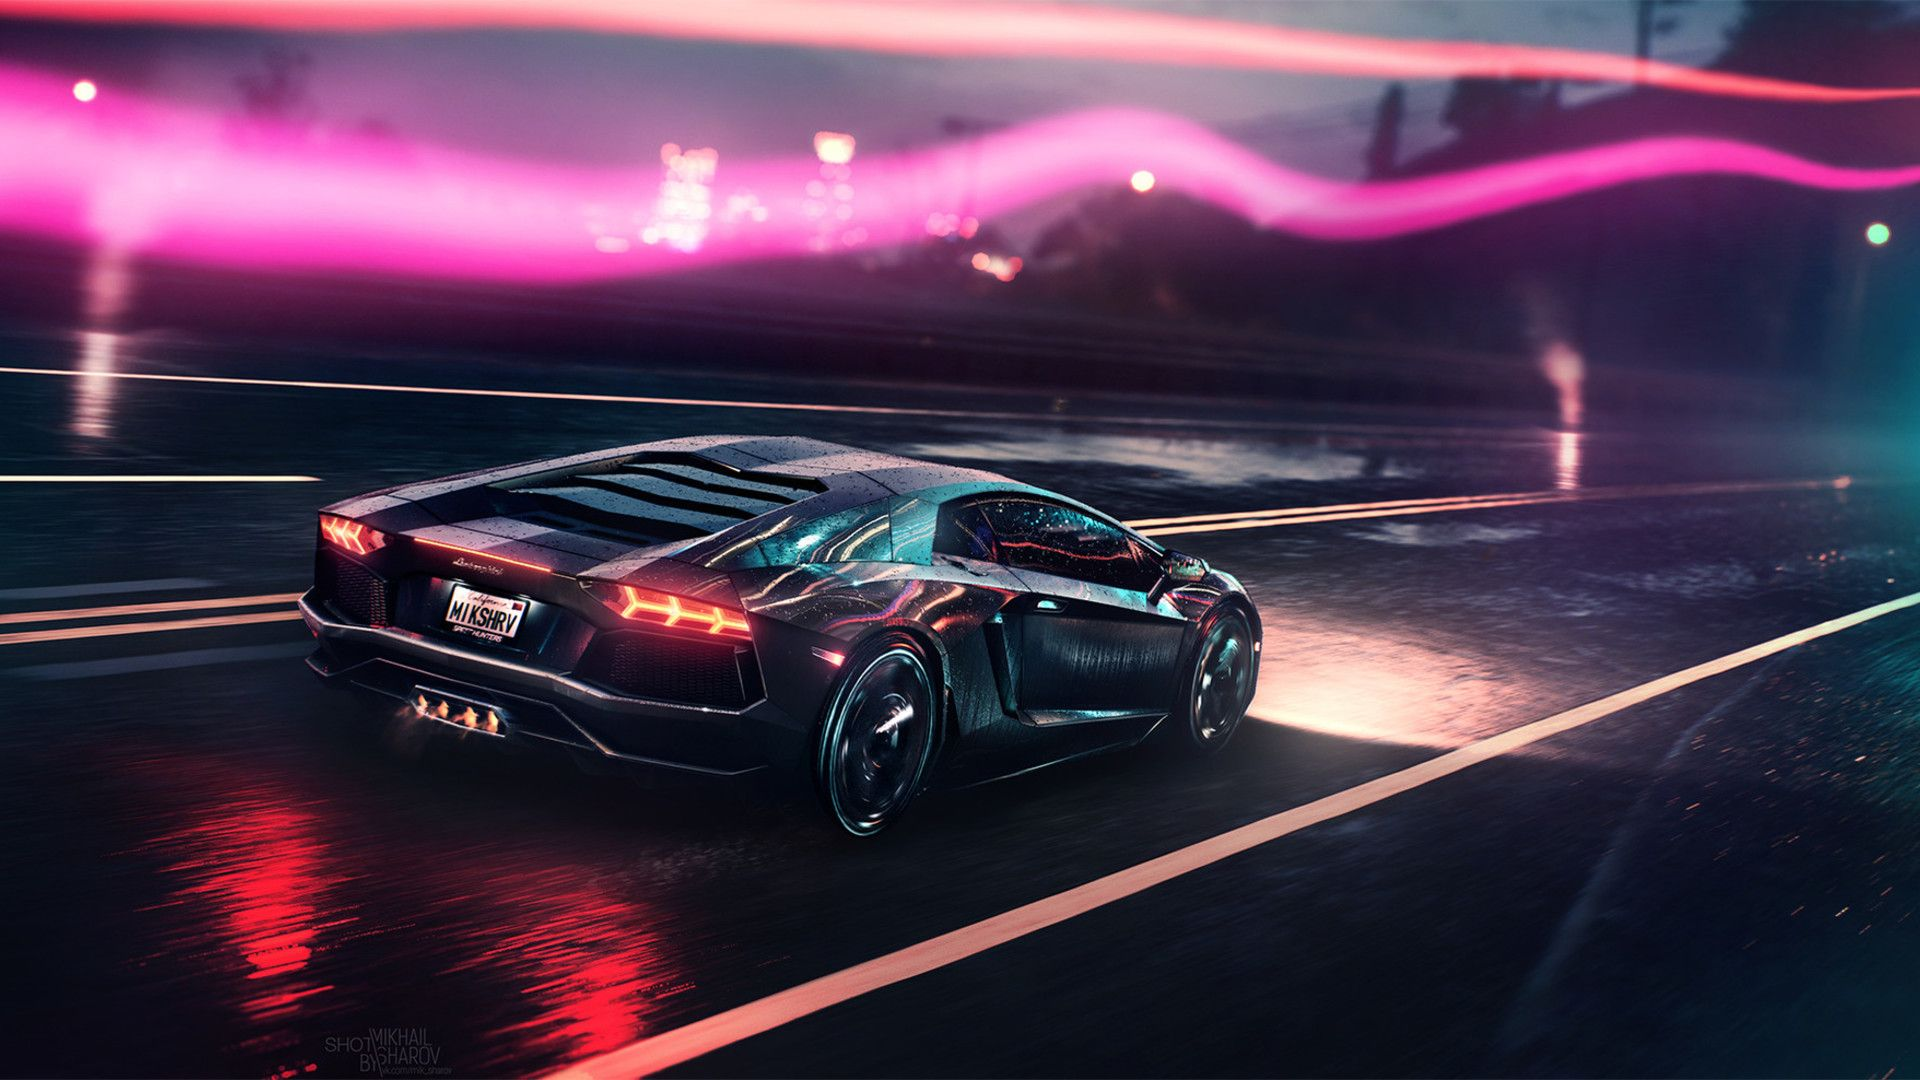 Neon Lamborghini Wallpapers Top Free Neon Lamborghini